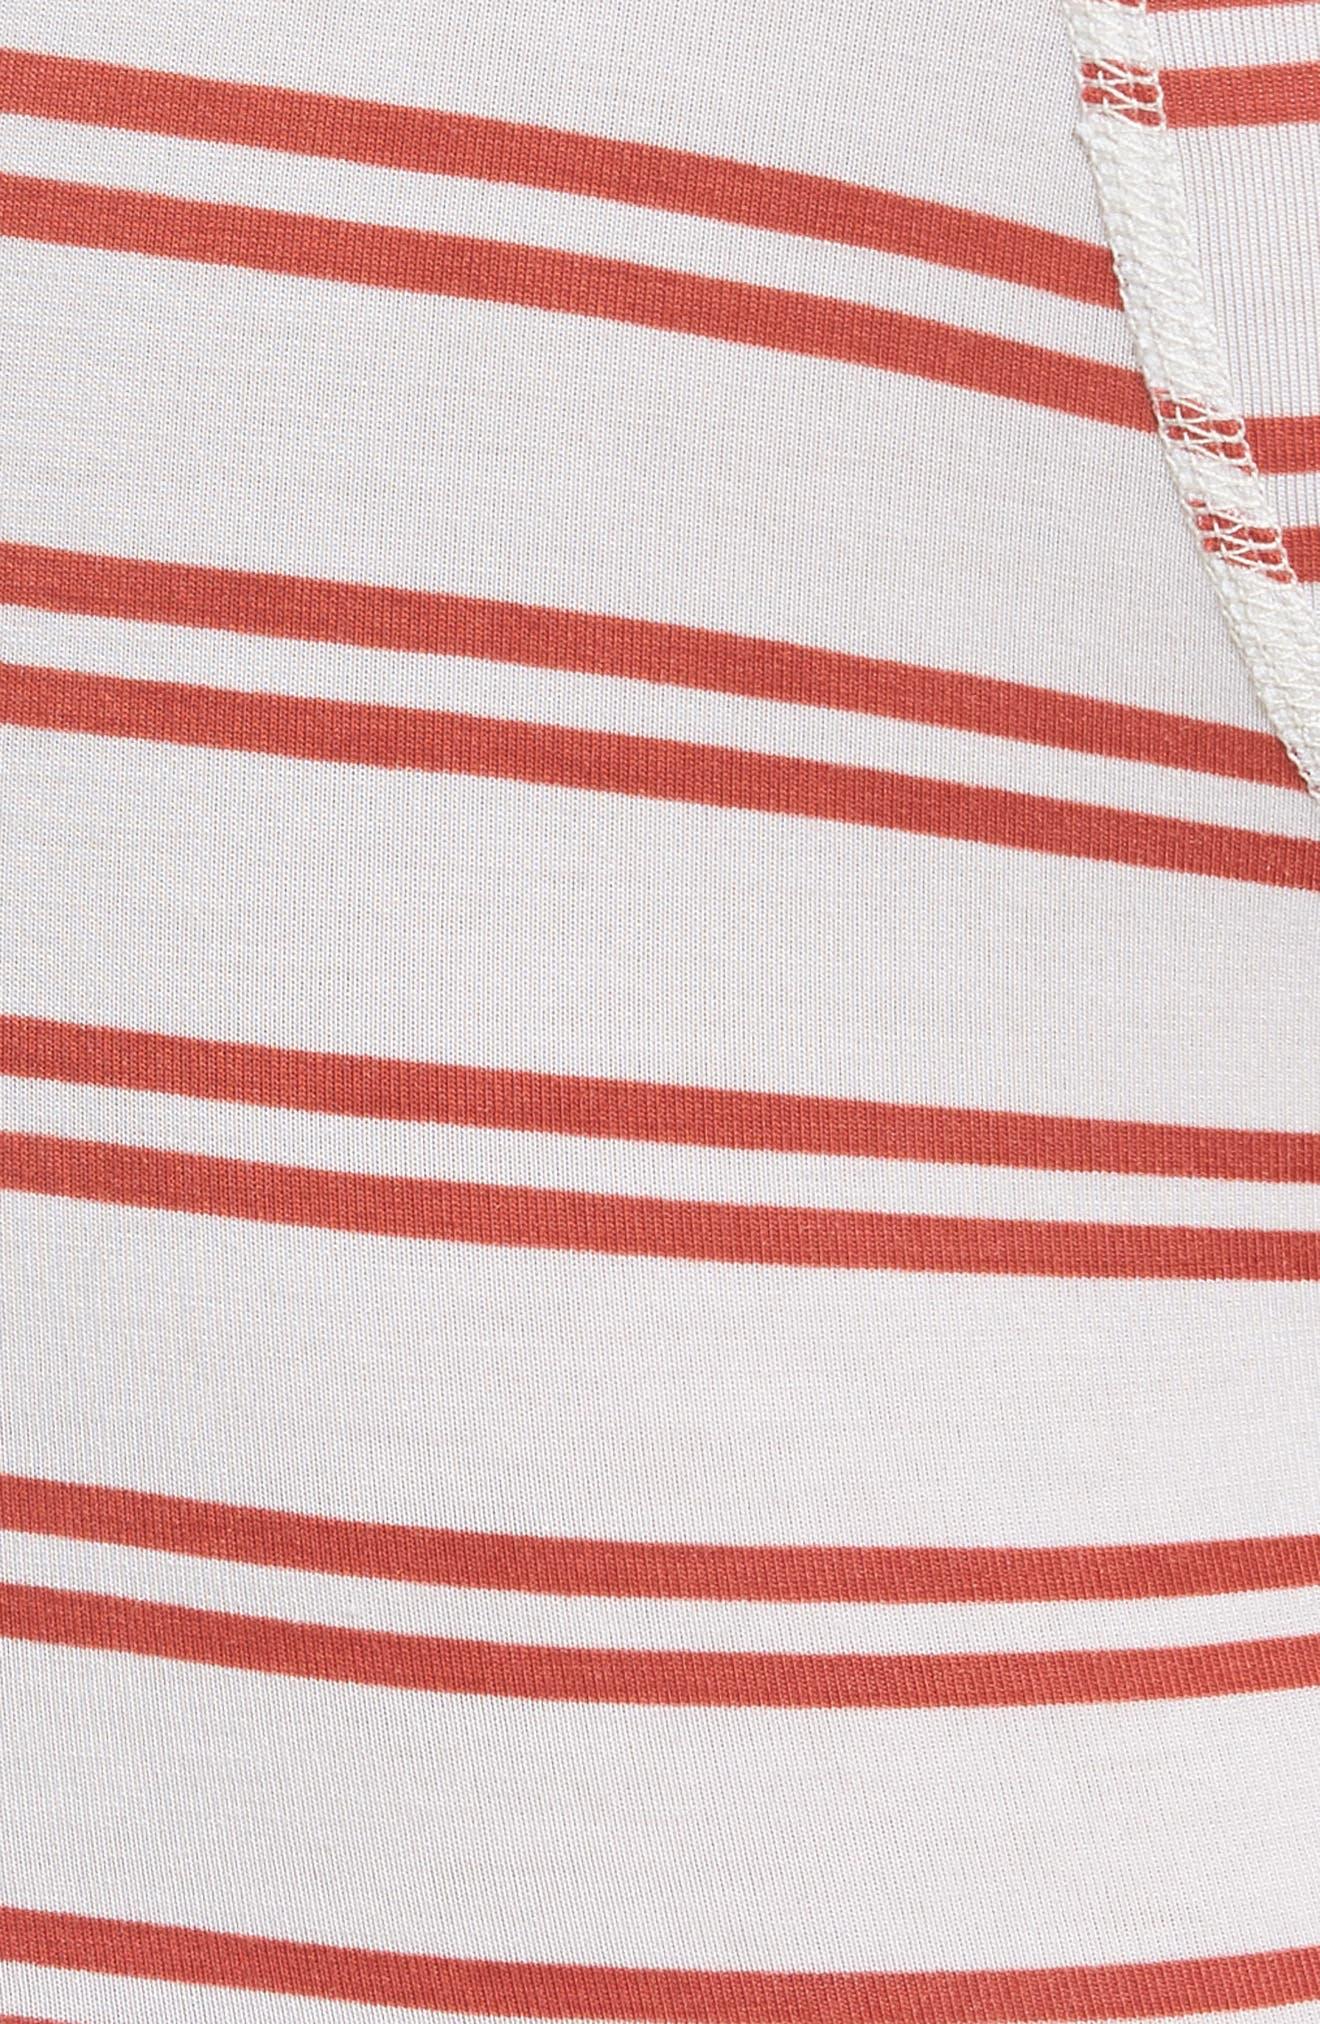 Clark Modal Boxer Briefs,                             Alternate thumbnail 5, color,                             WHITE/ RED